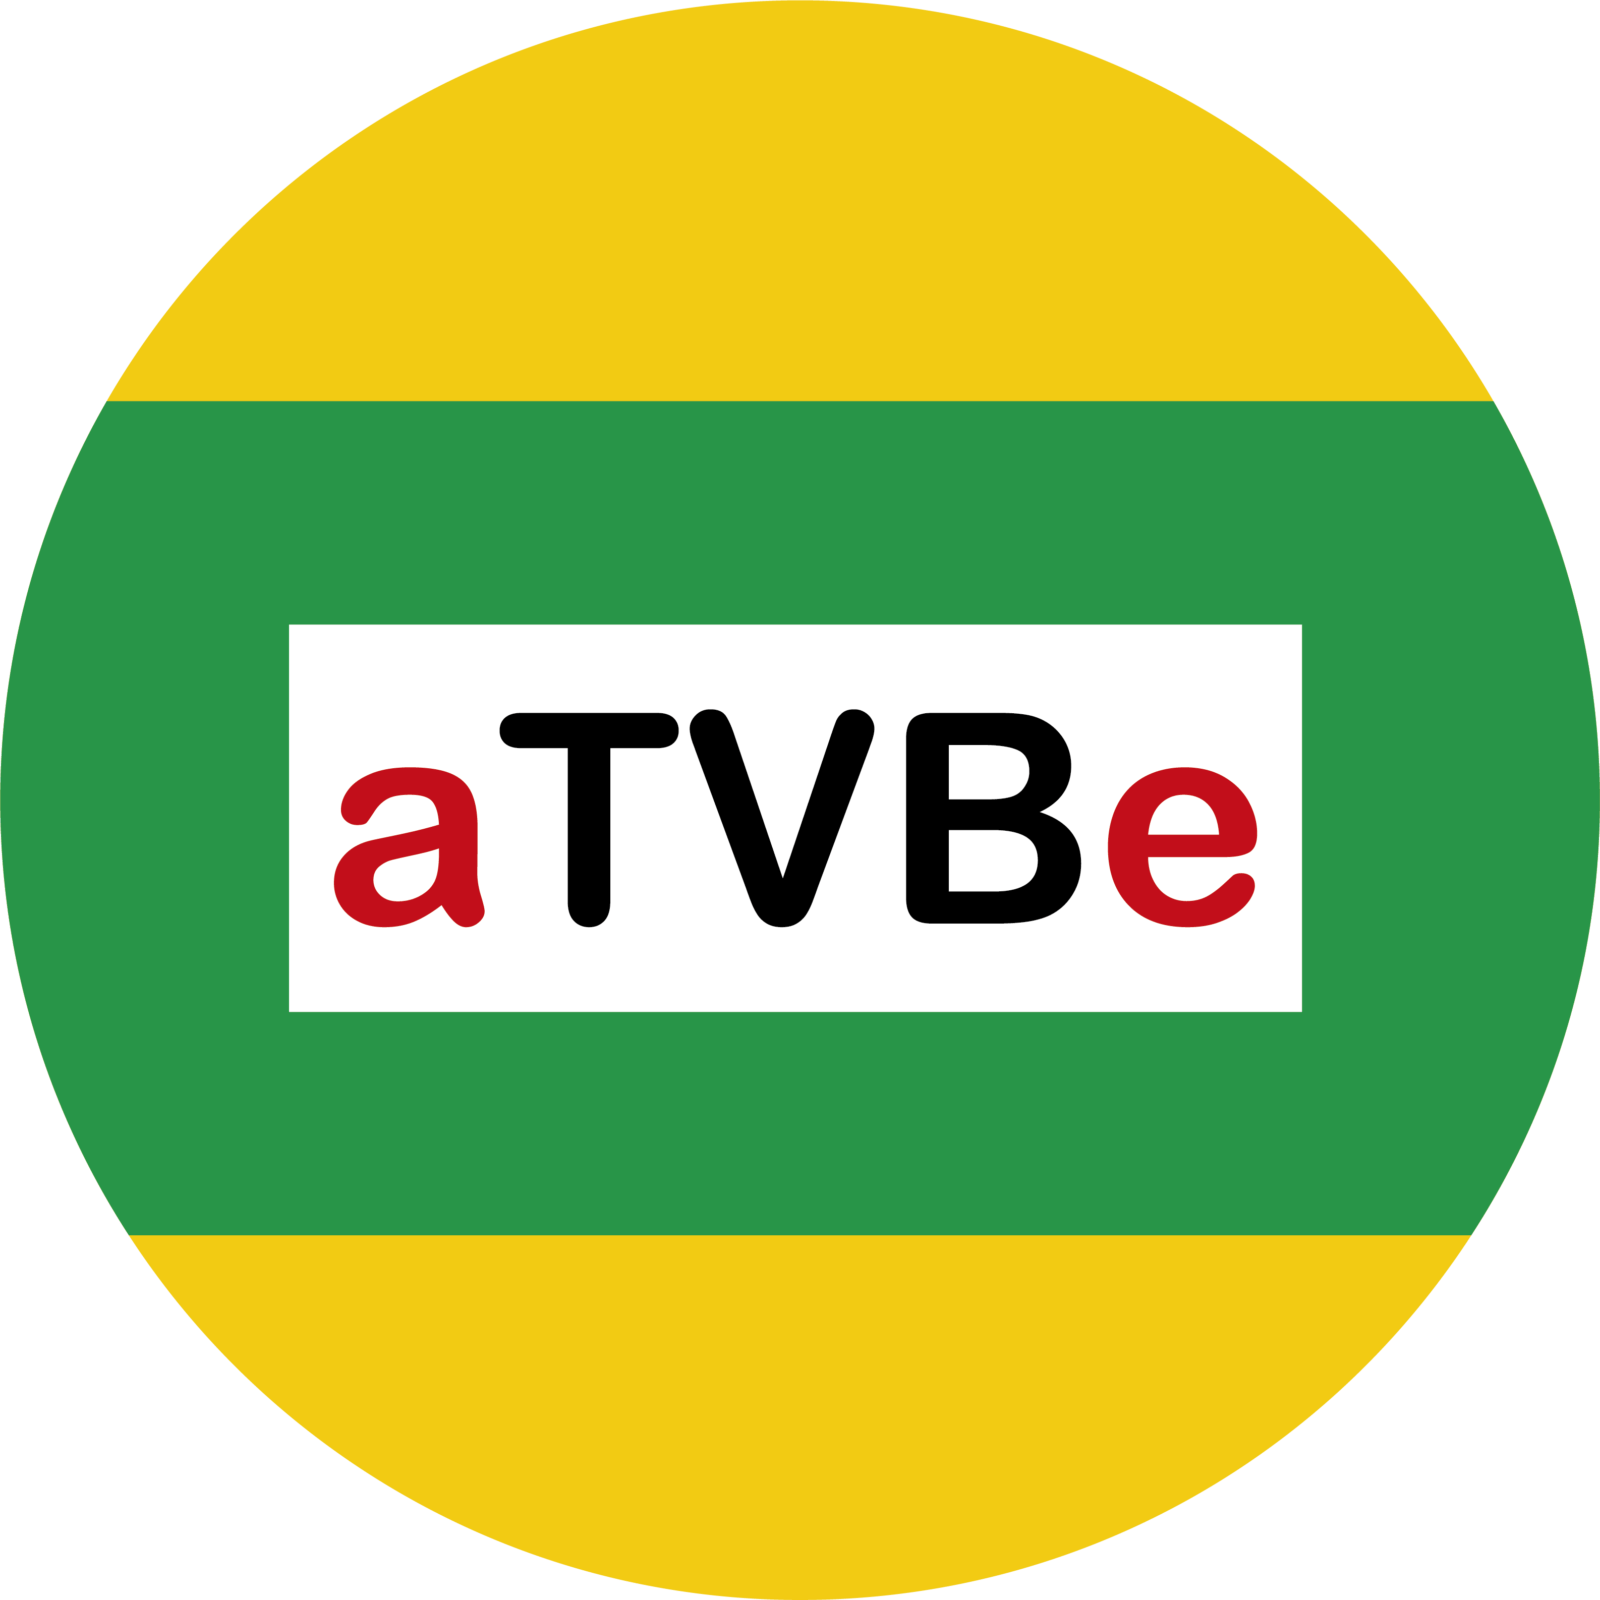 aTVBe